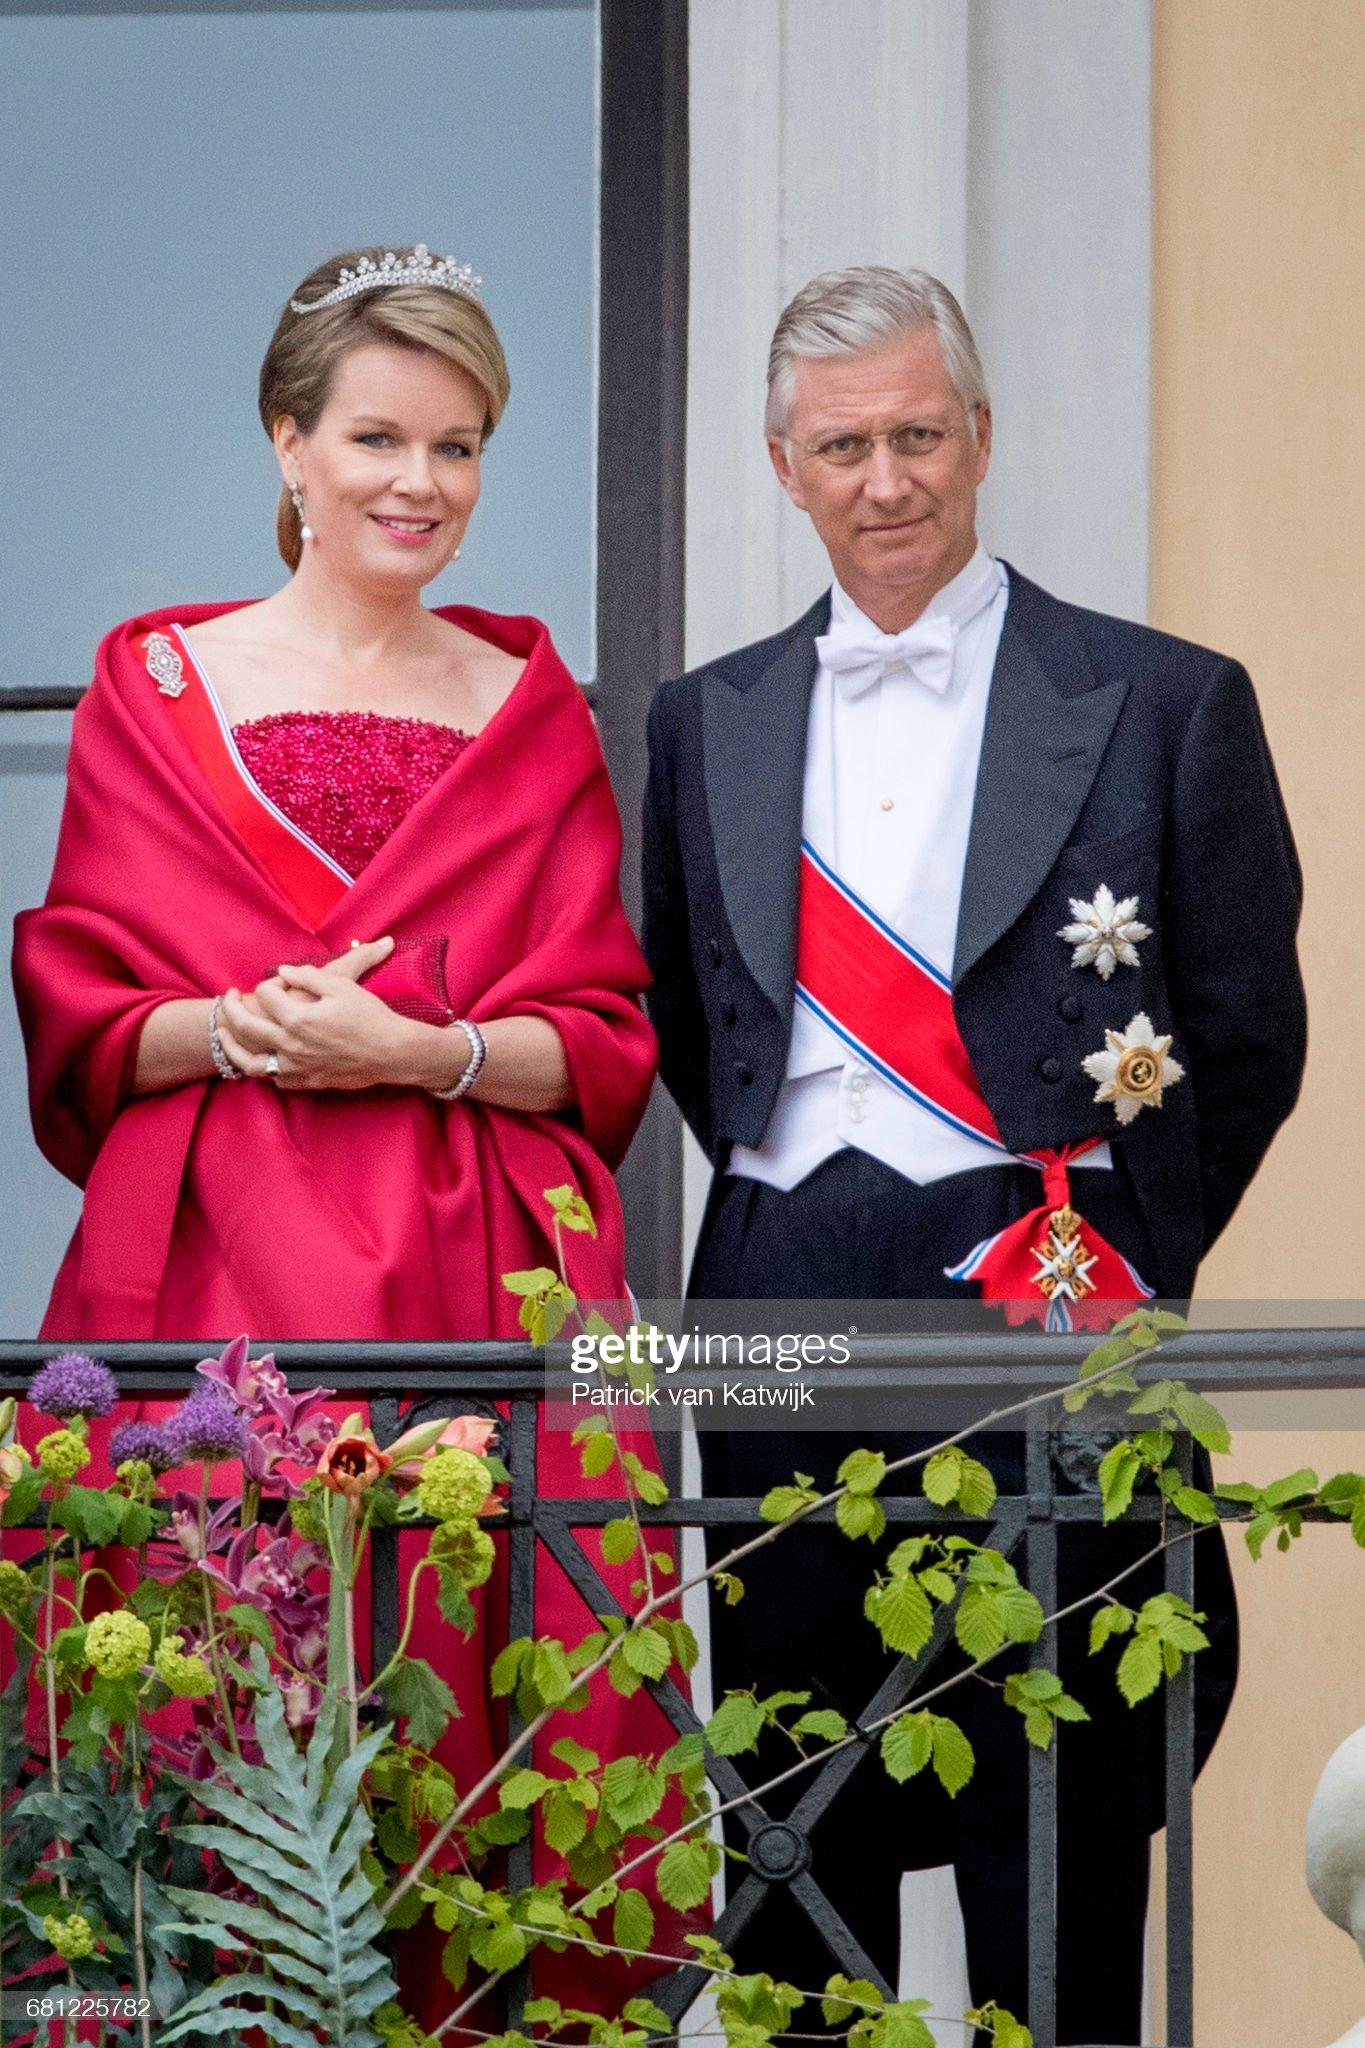 Вечерние наряды Королевы Матильды King and Queen Of Norway Celebrate Their 80th Birthdays - Day 1 : News Photo